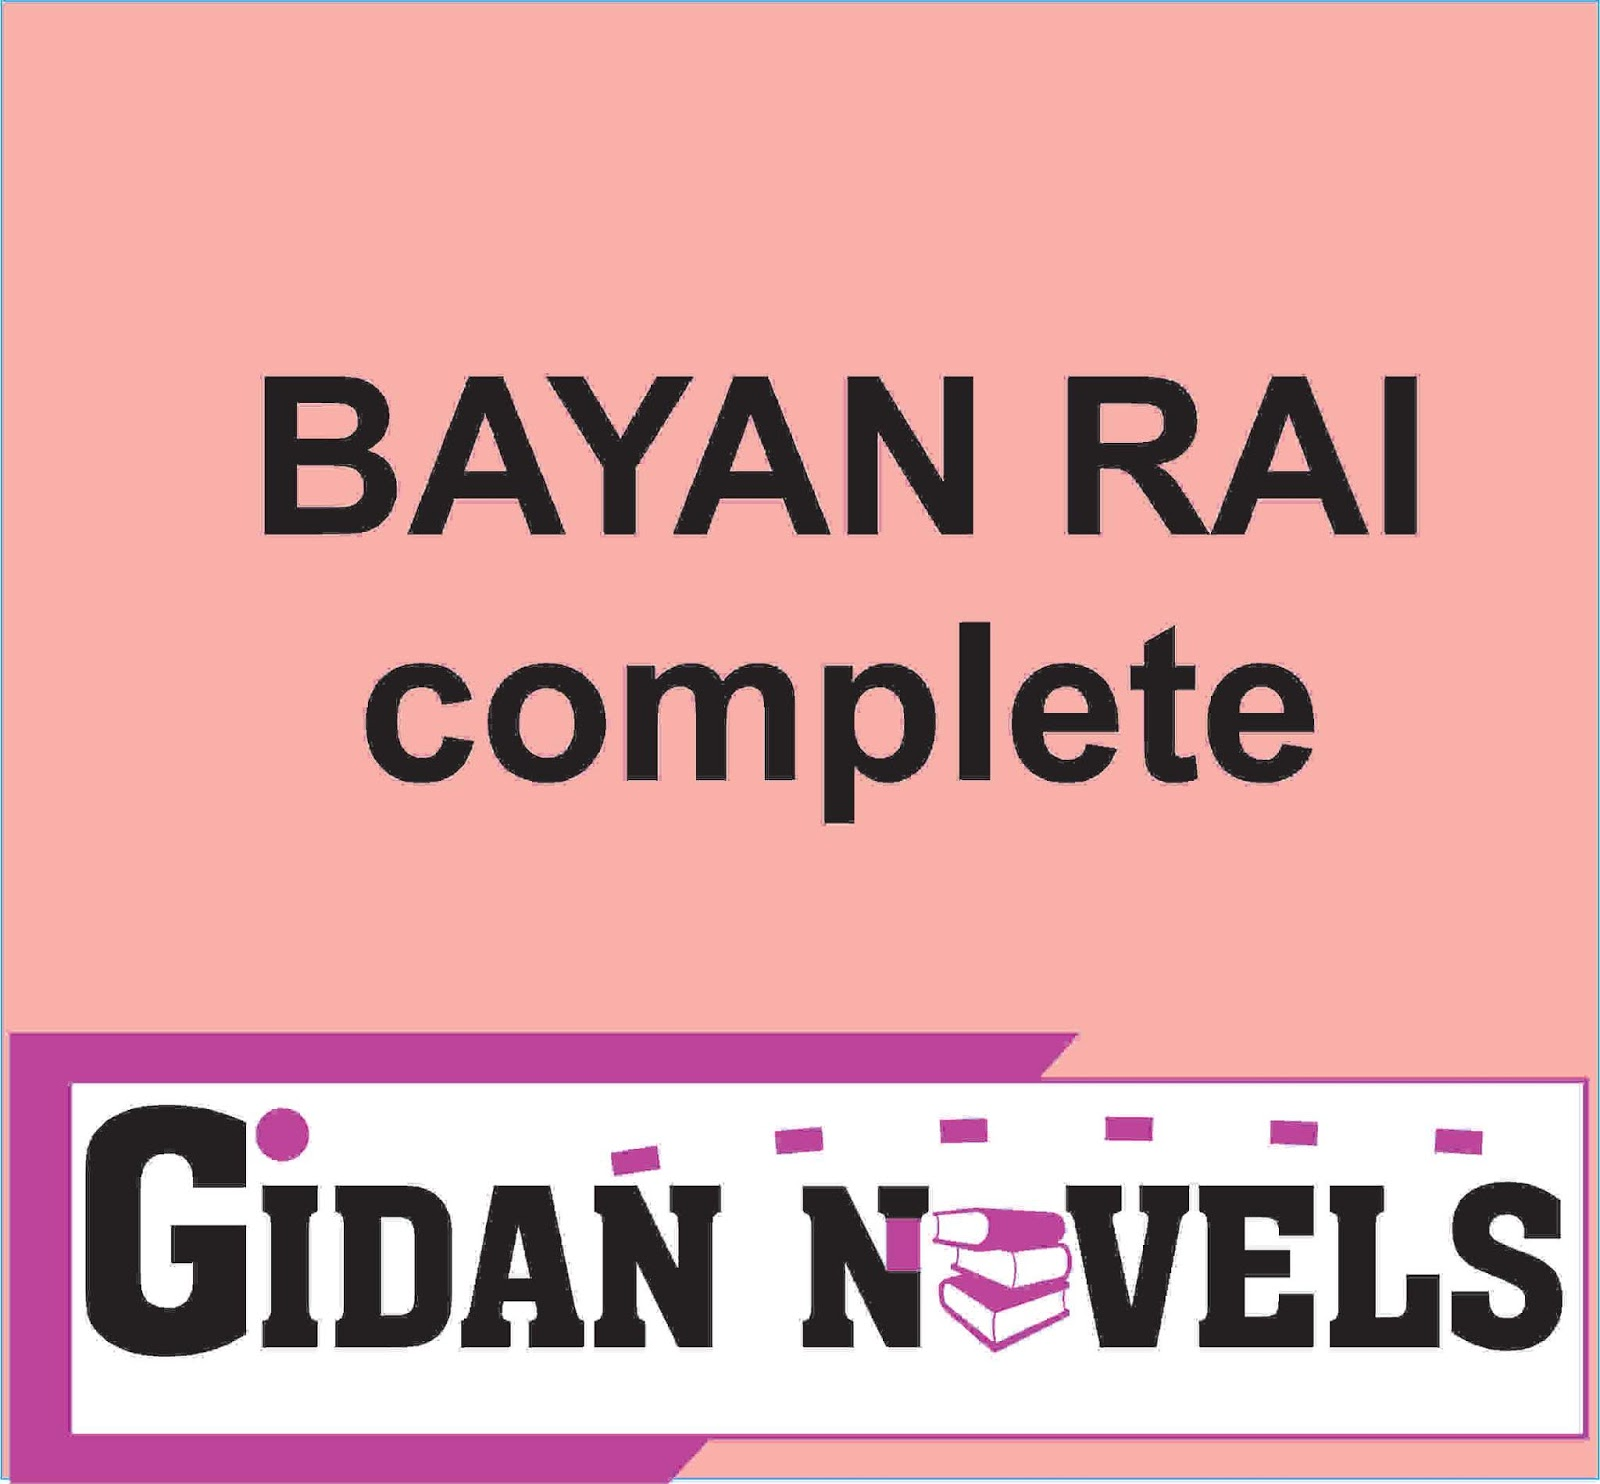 BAYAN RAI COMPLETE SHORT HAUSA STORY - Gidan Novels | Hausa